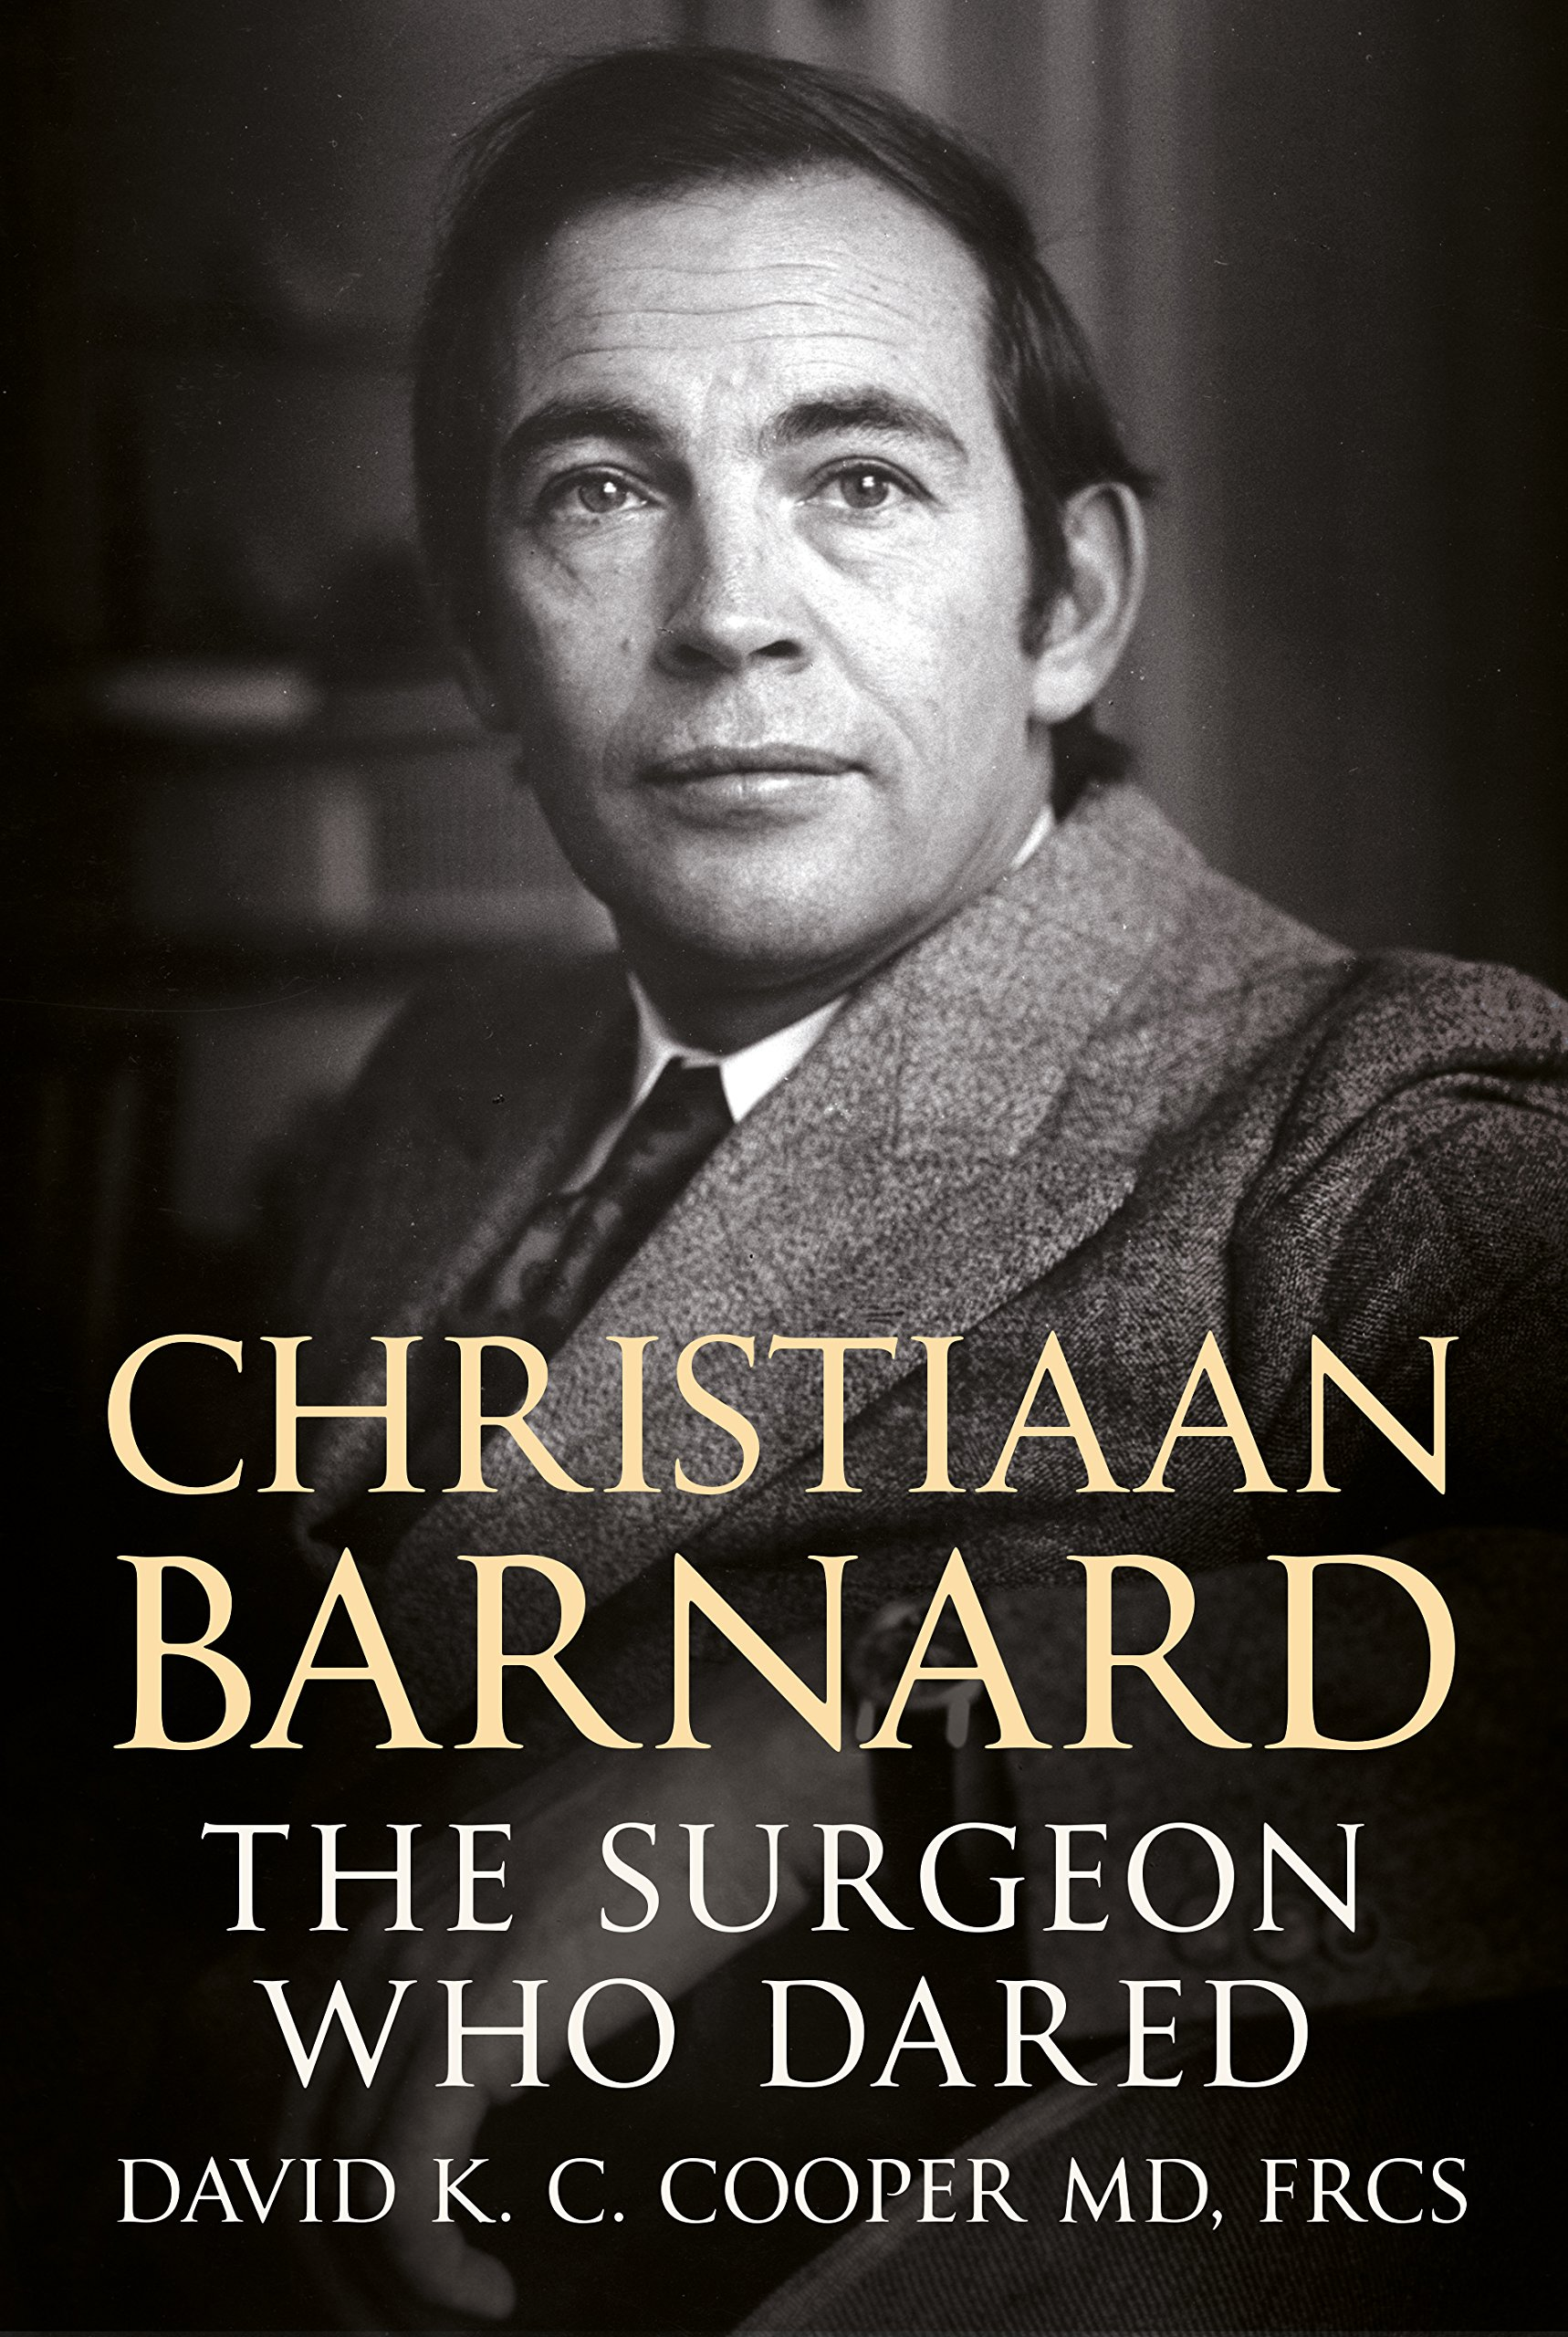 Download Christiaan Barnard: The Surgeon Who Dared ebook